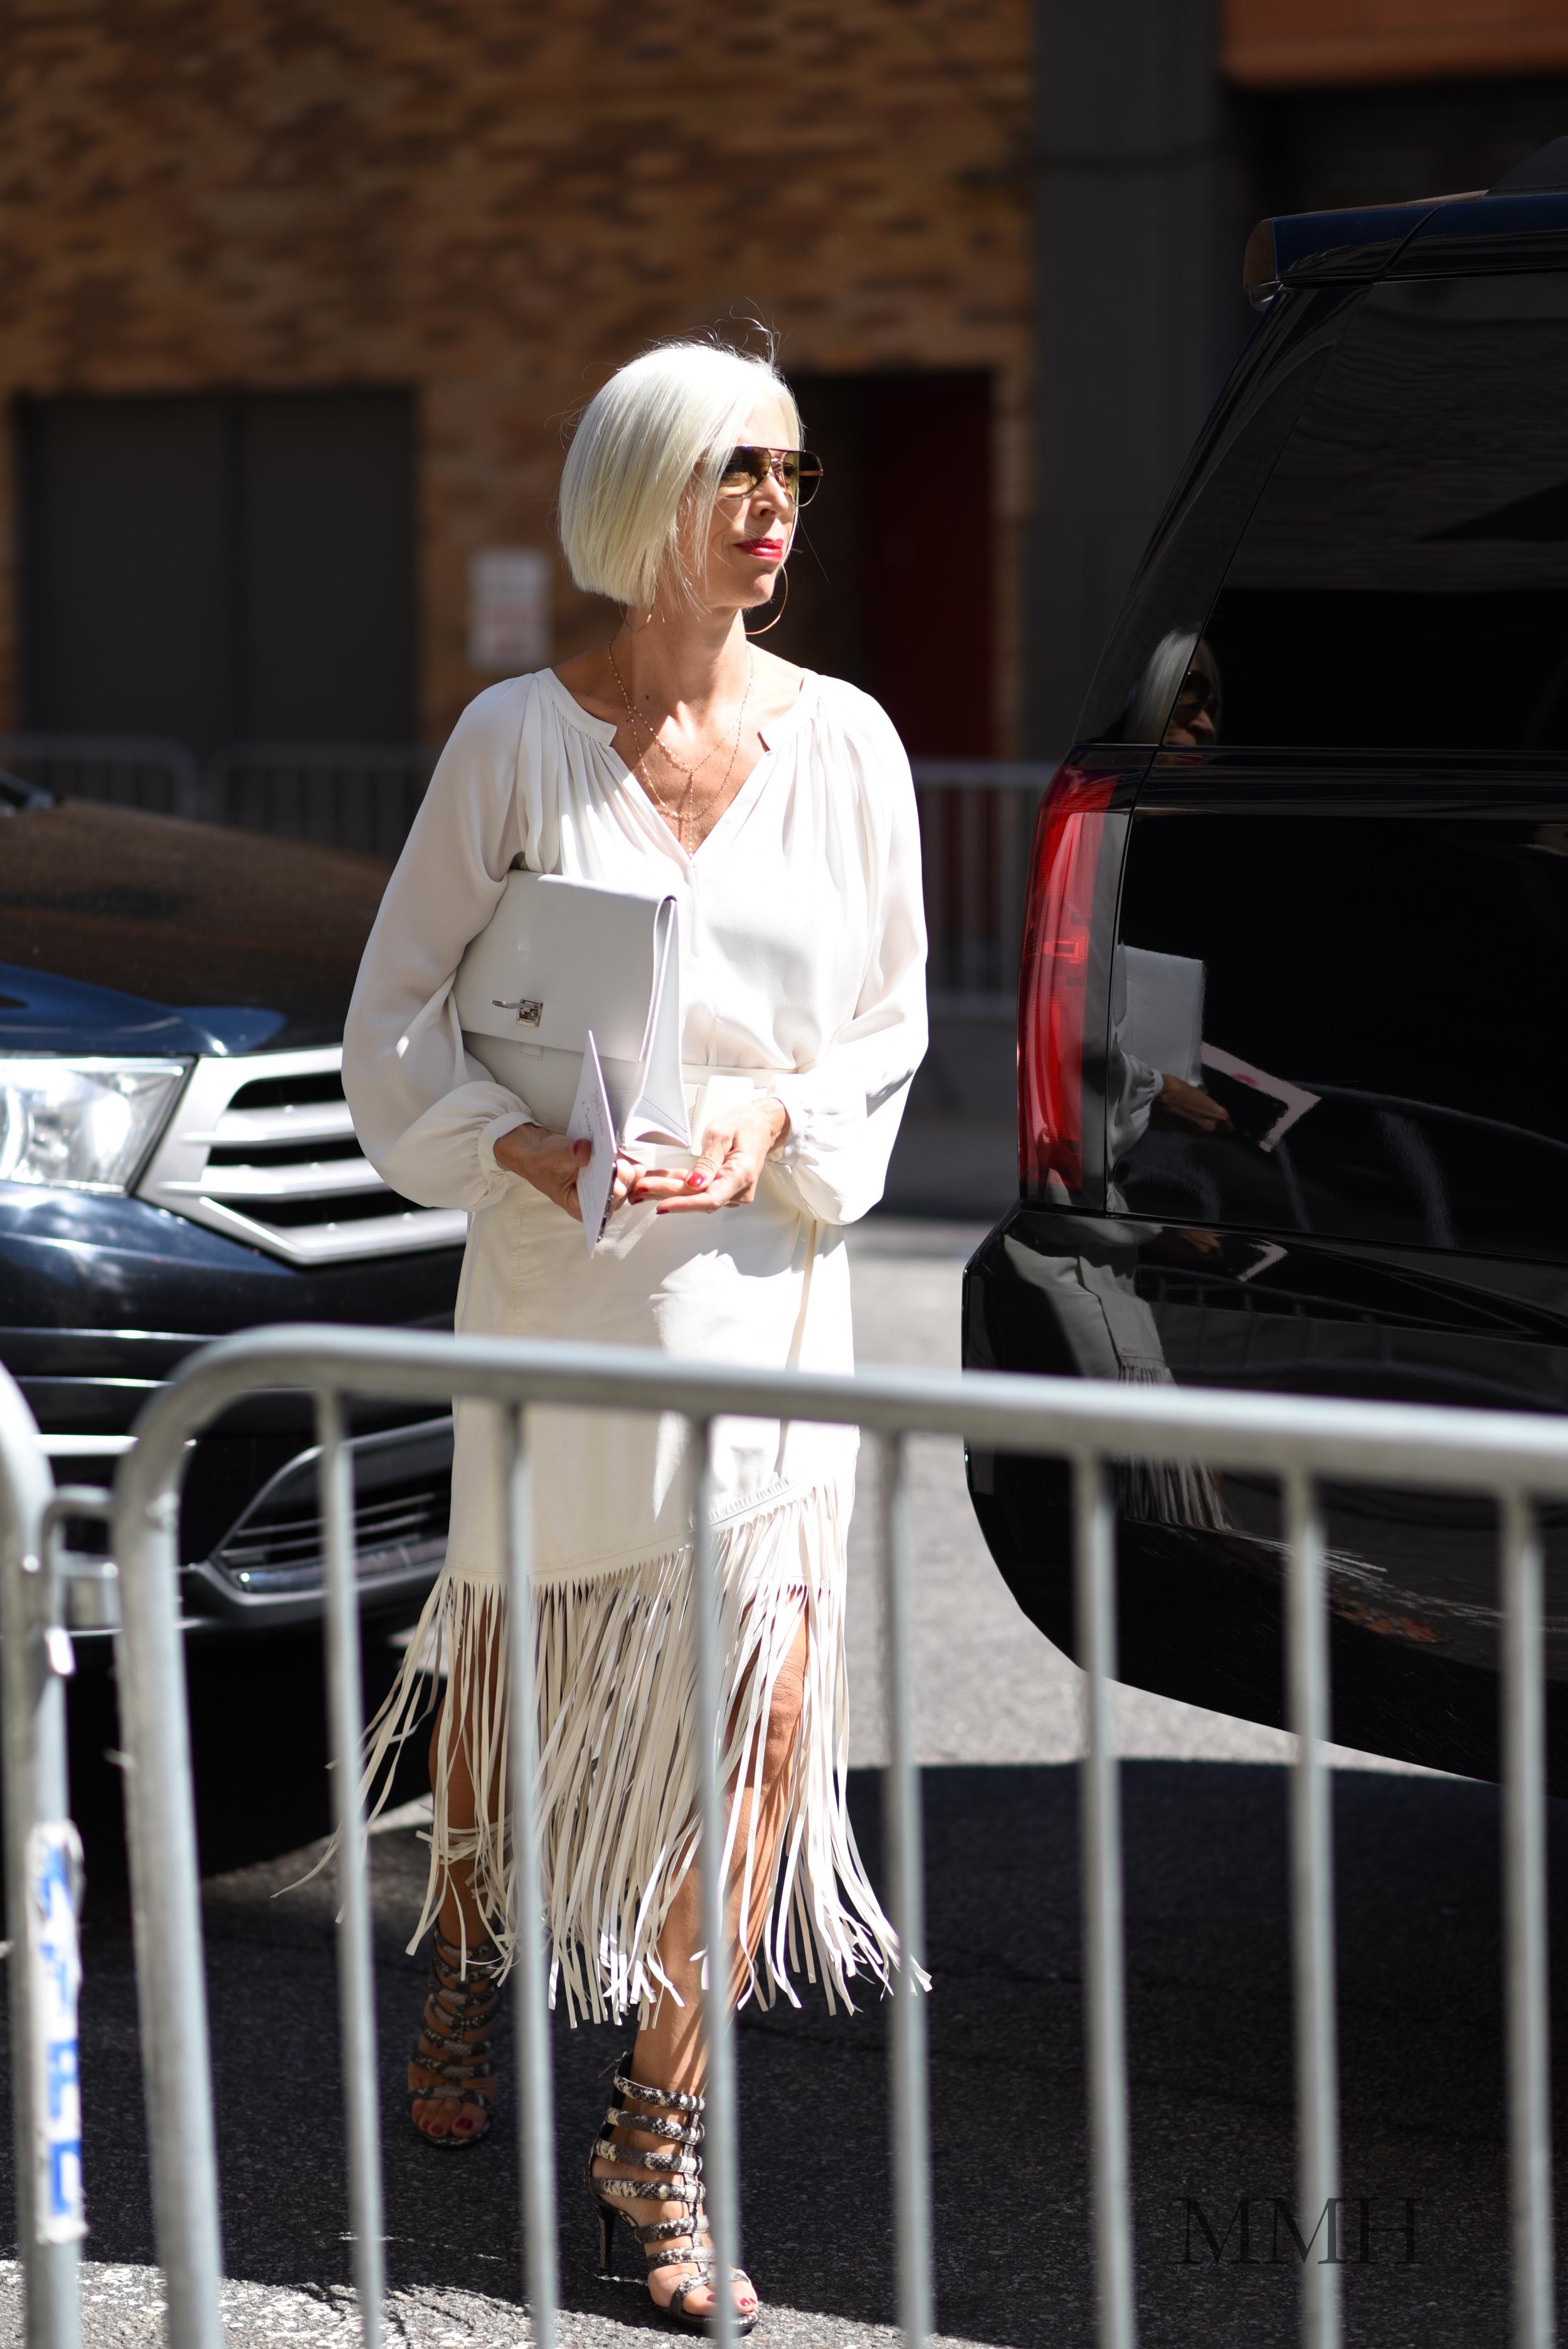 Linda Fargo, Senior Vice President of the Fashion Office at Bergdorf Goodman